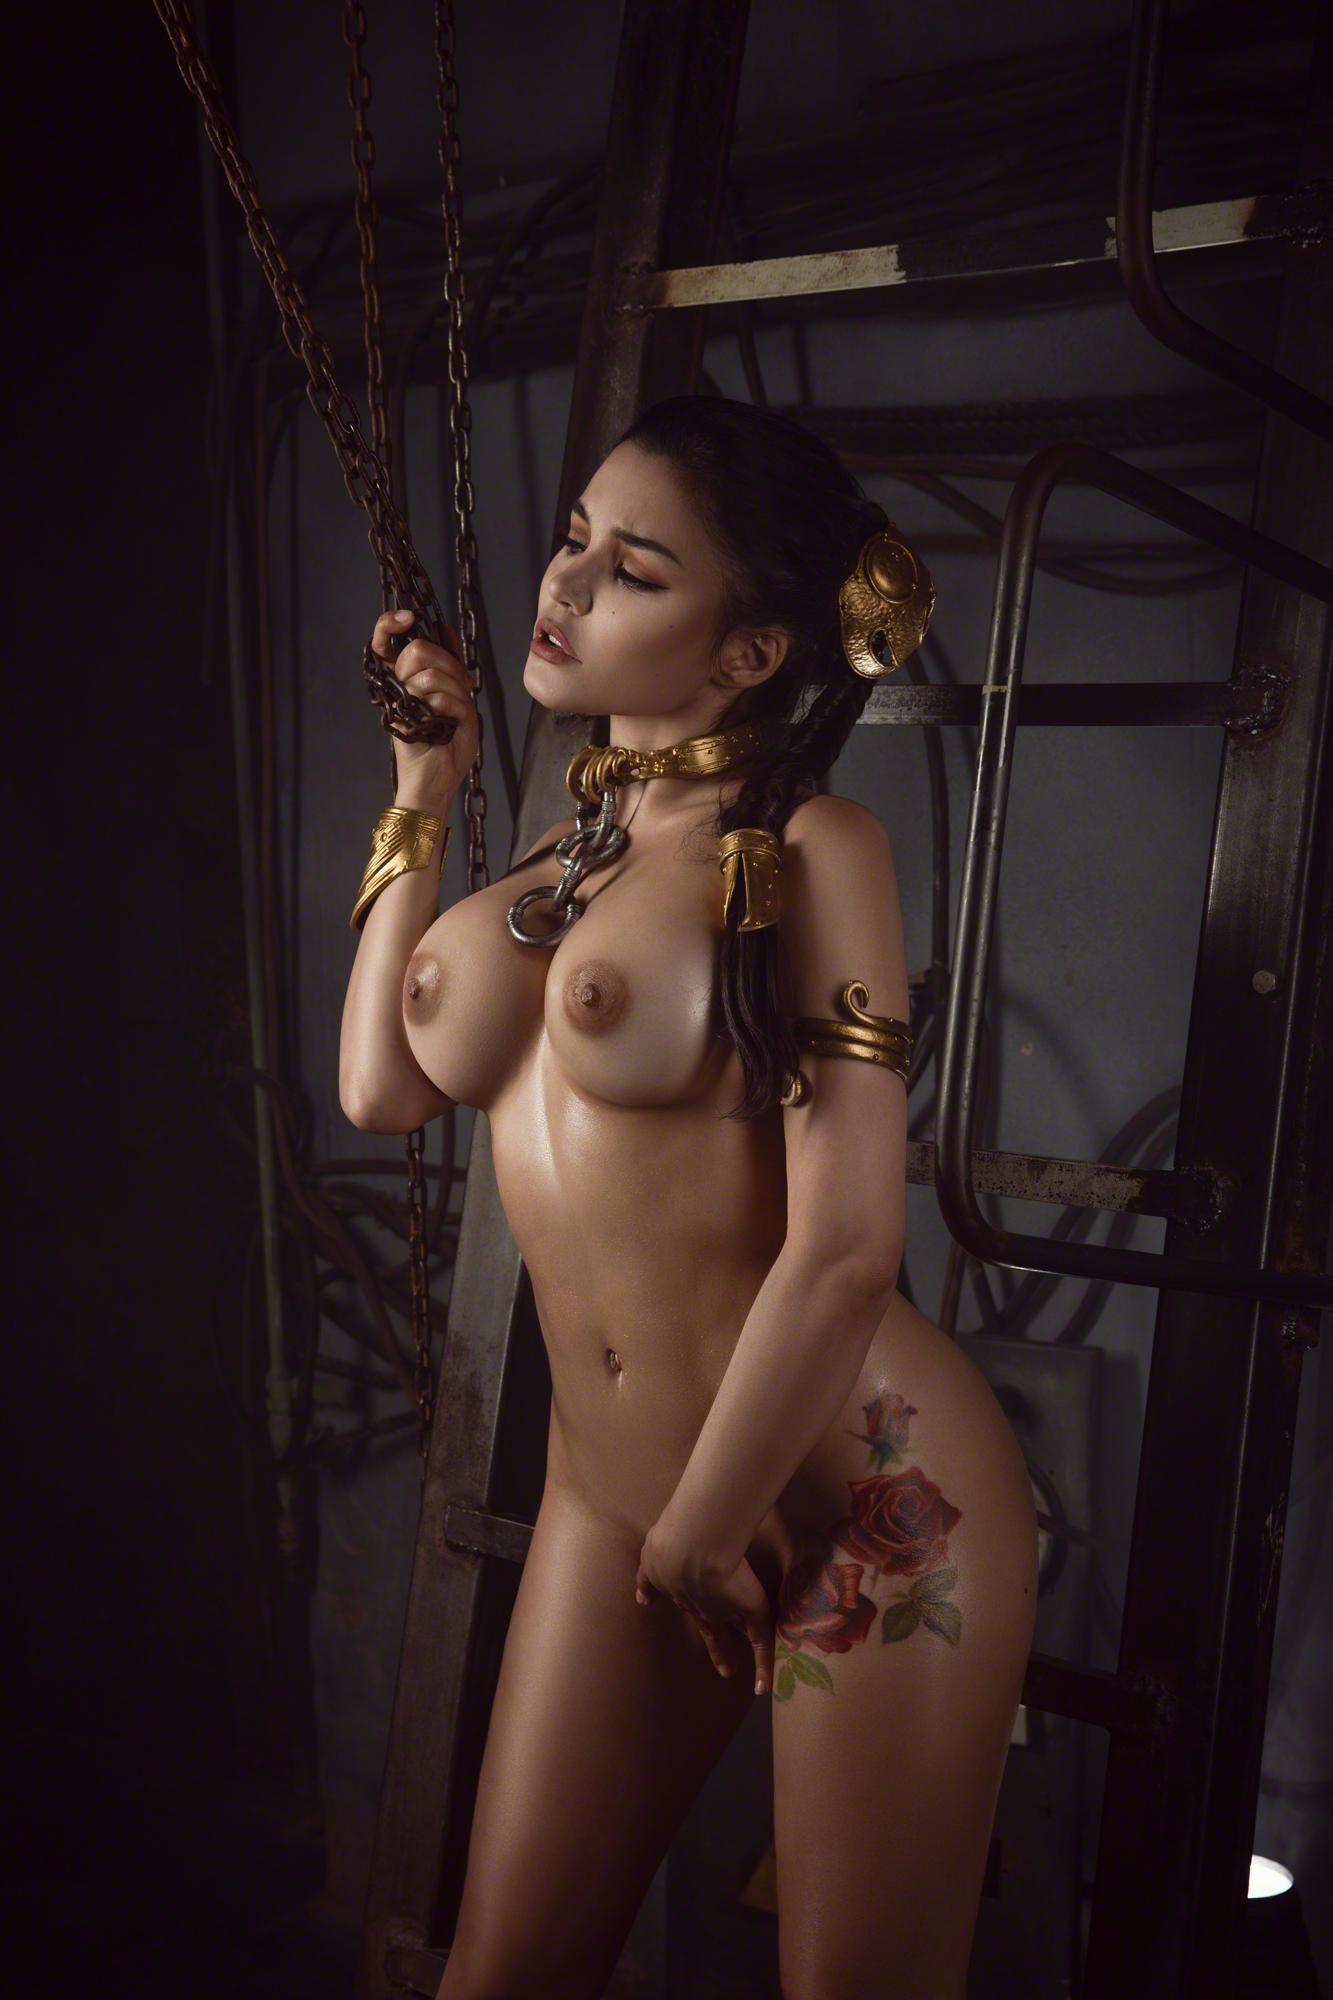 Kalinka Fox Nude Princess Leia Cosplay Set Leaked Bfvrkn